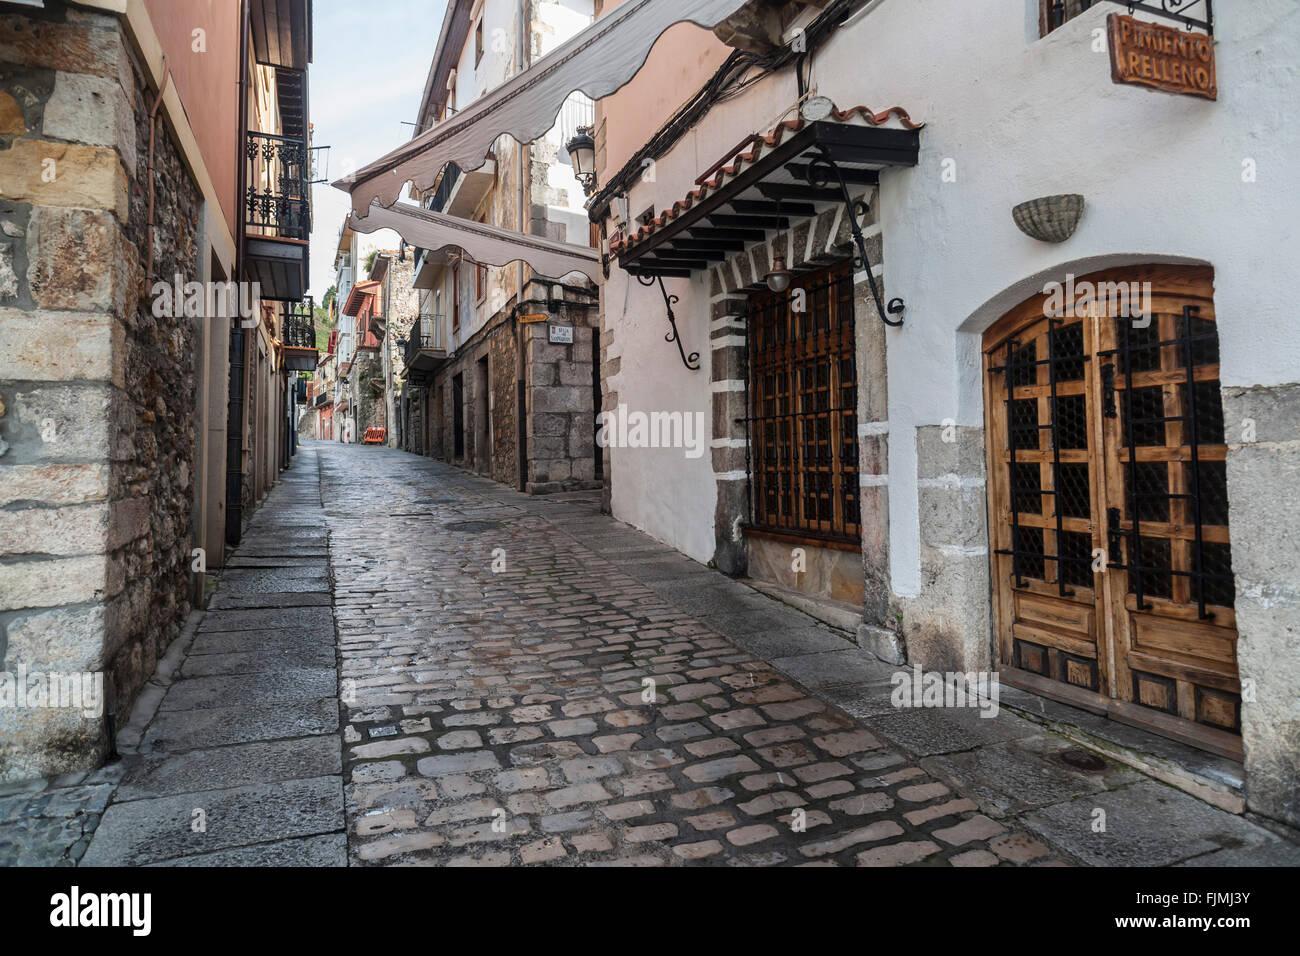 Puebla Vieja, Laredo,Cantabria,Spain - Stock Image